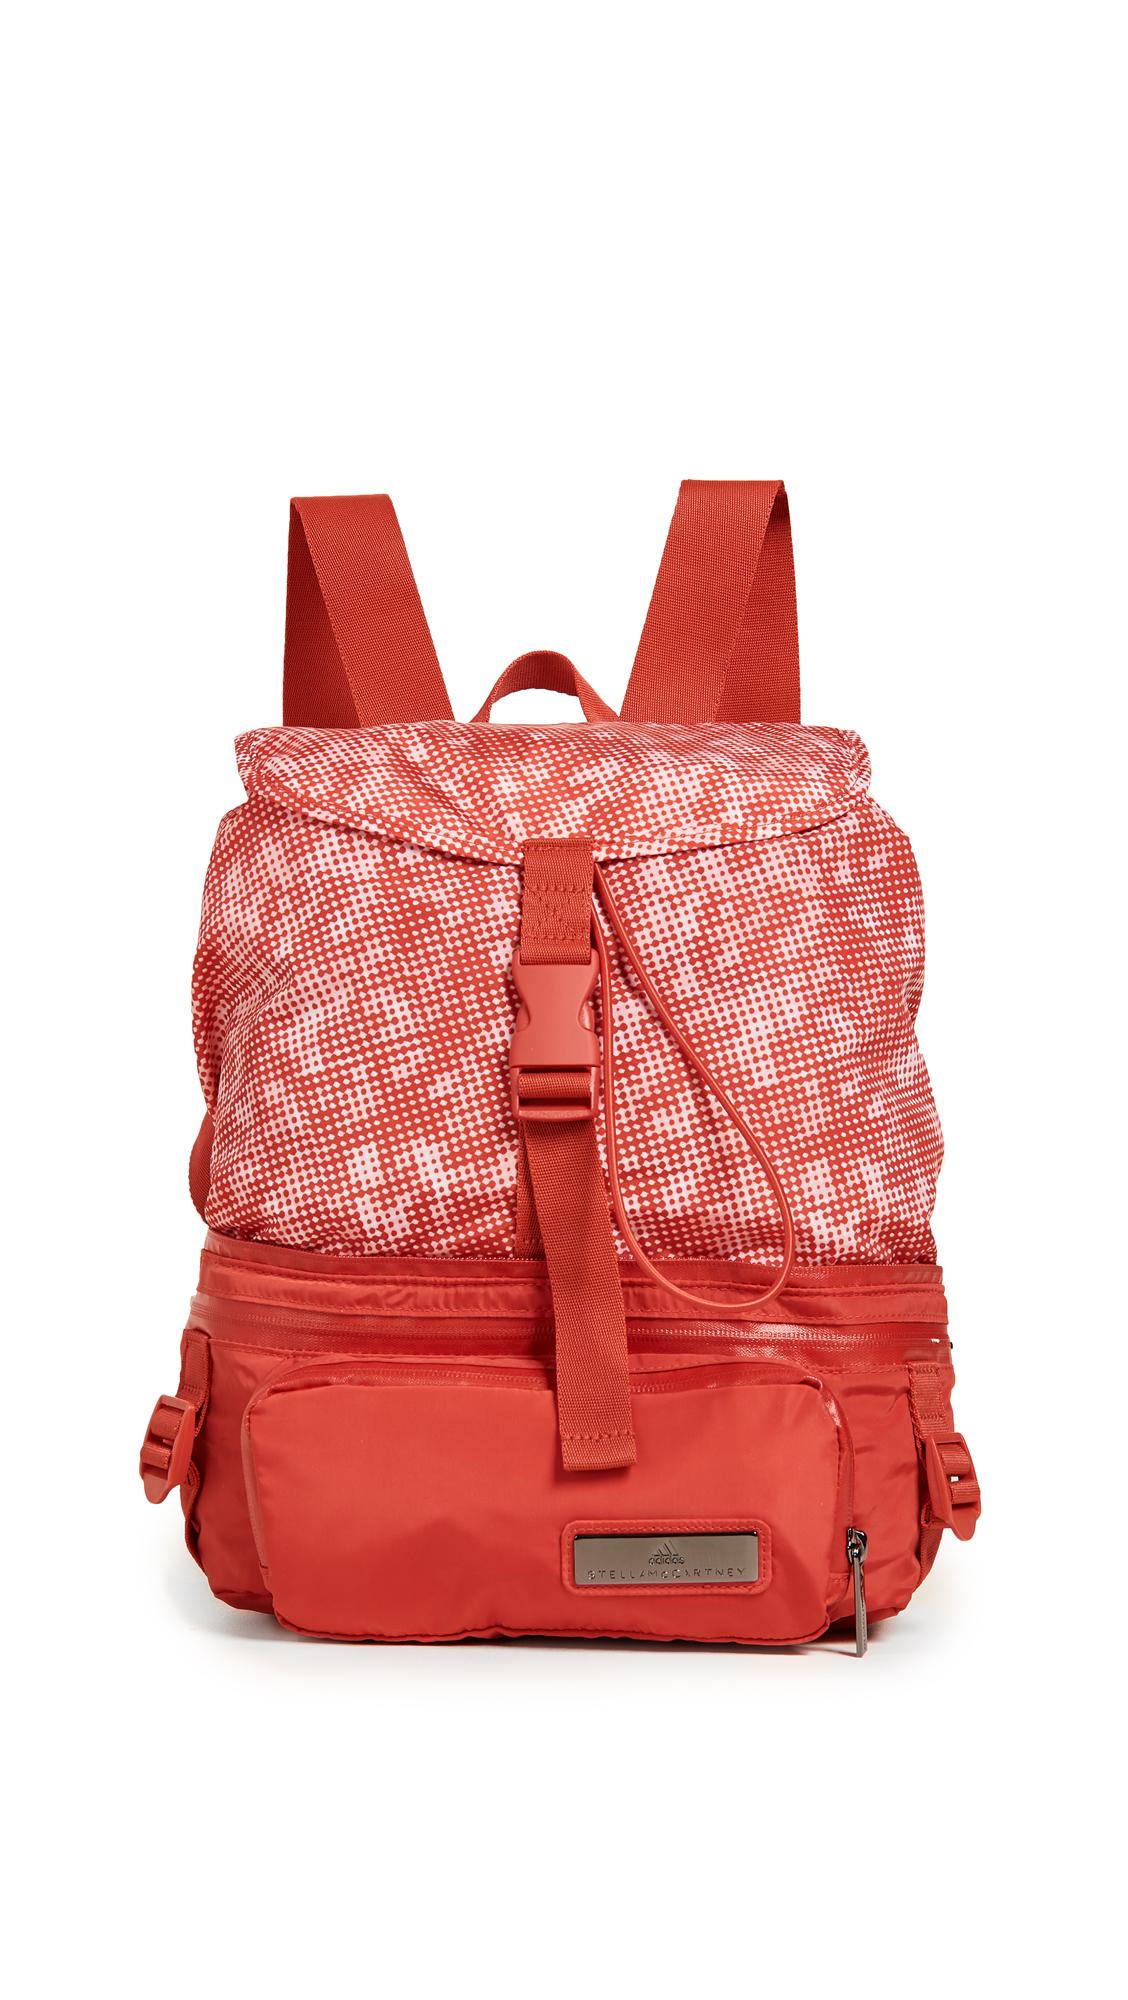 adidas by Stella McCartney Convertible Backpack - Dark Callisto/White